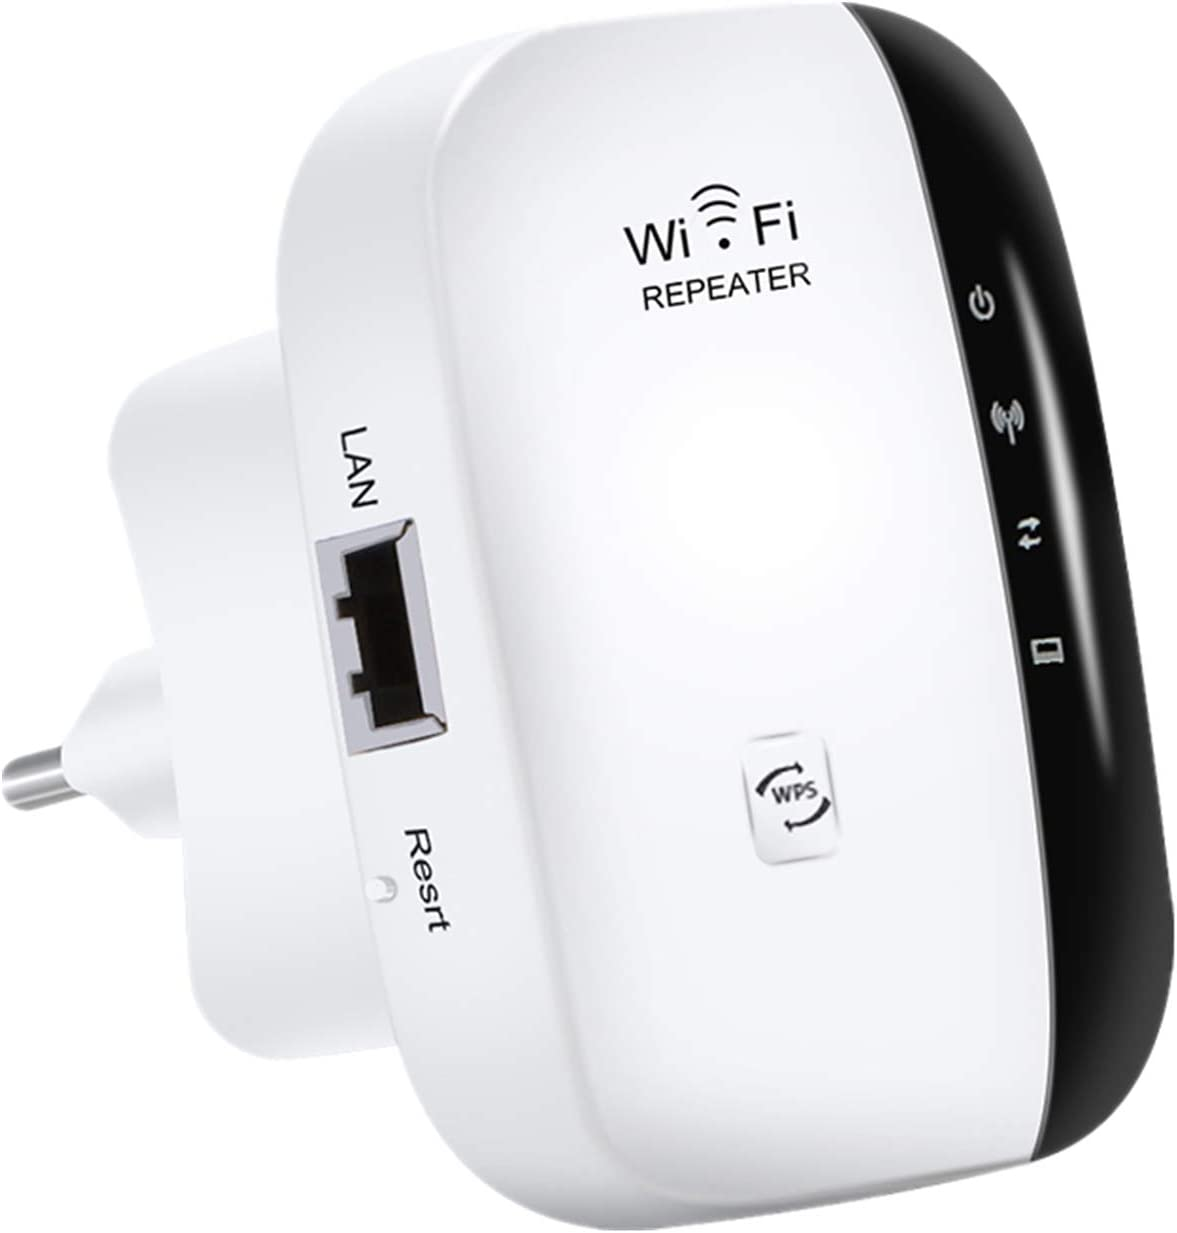 Unibelin Wlan Repeater Wlan Verstärker Wireless Netz Computer Zubehör